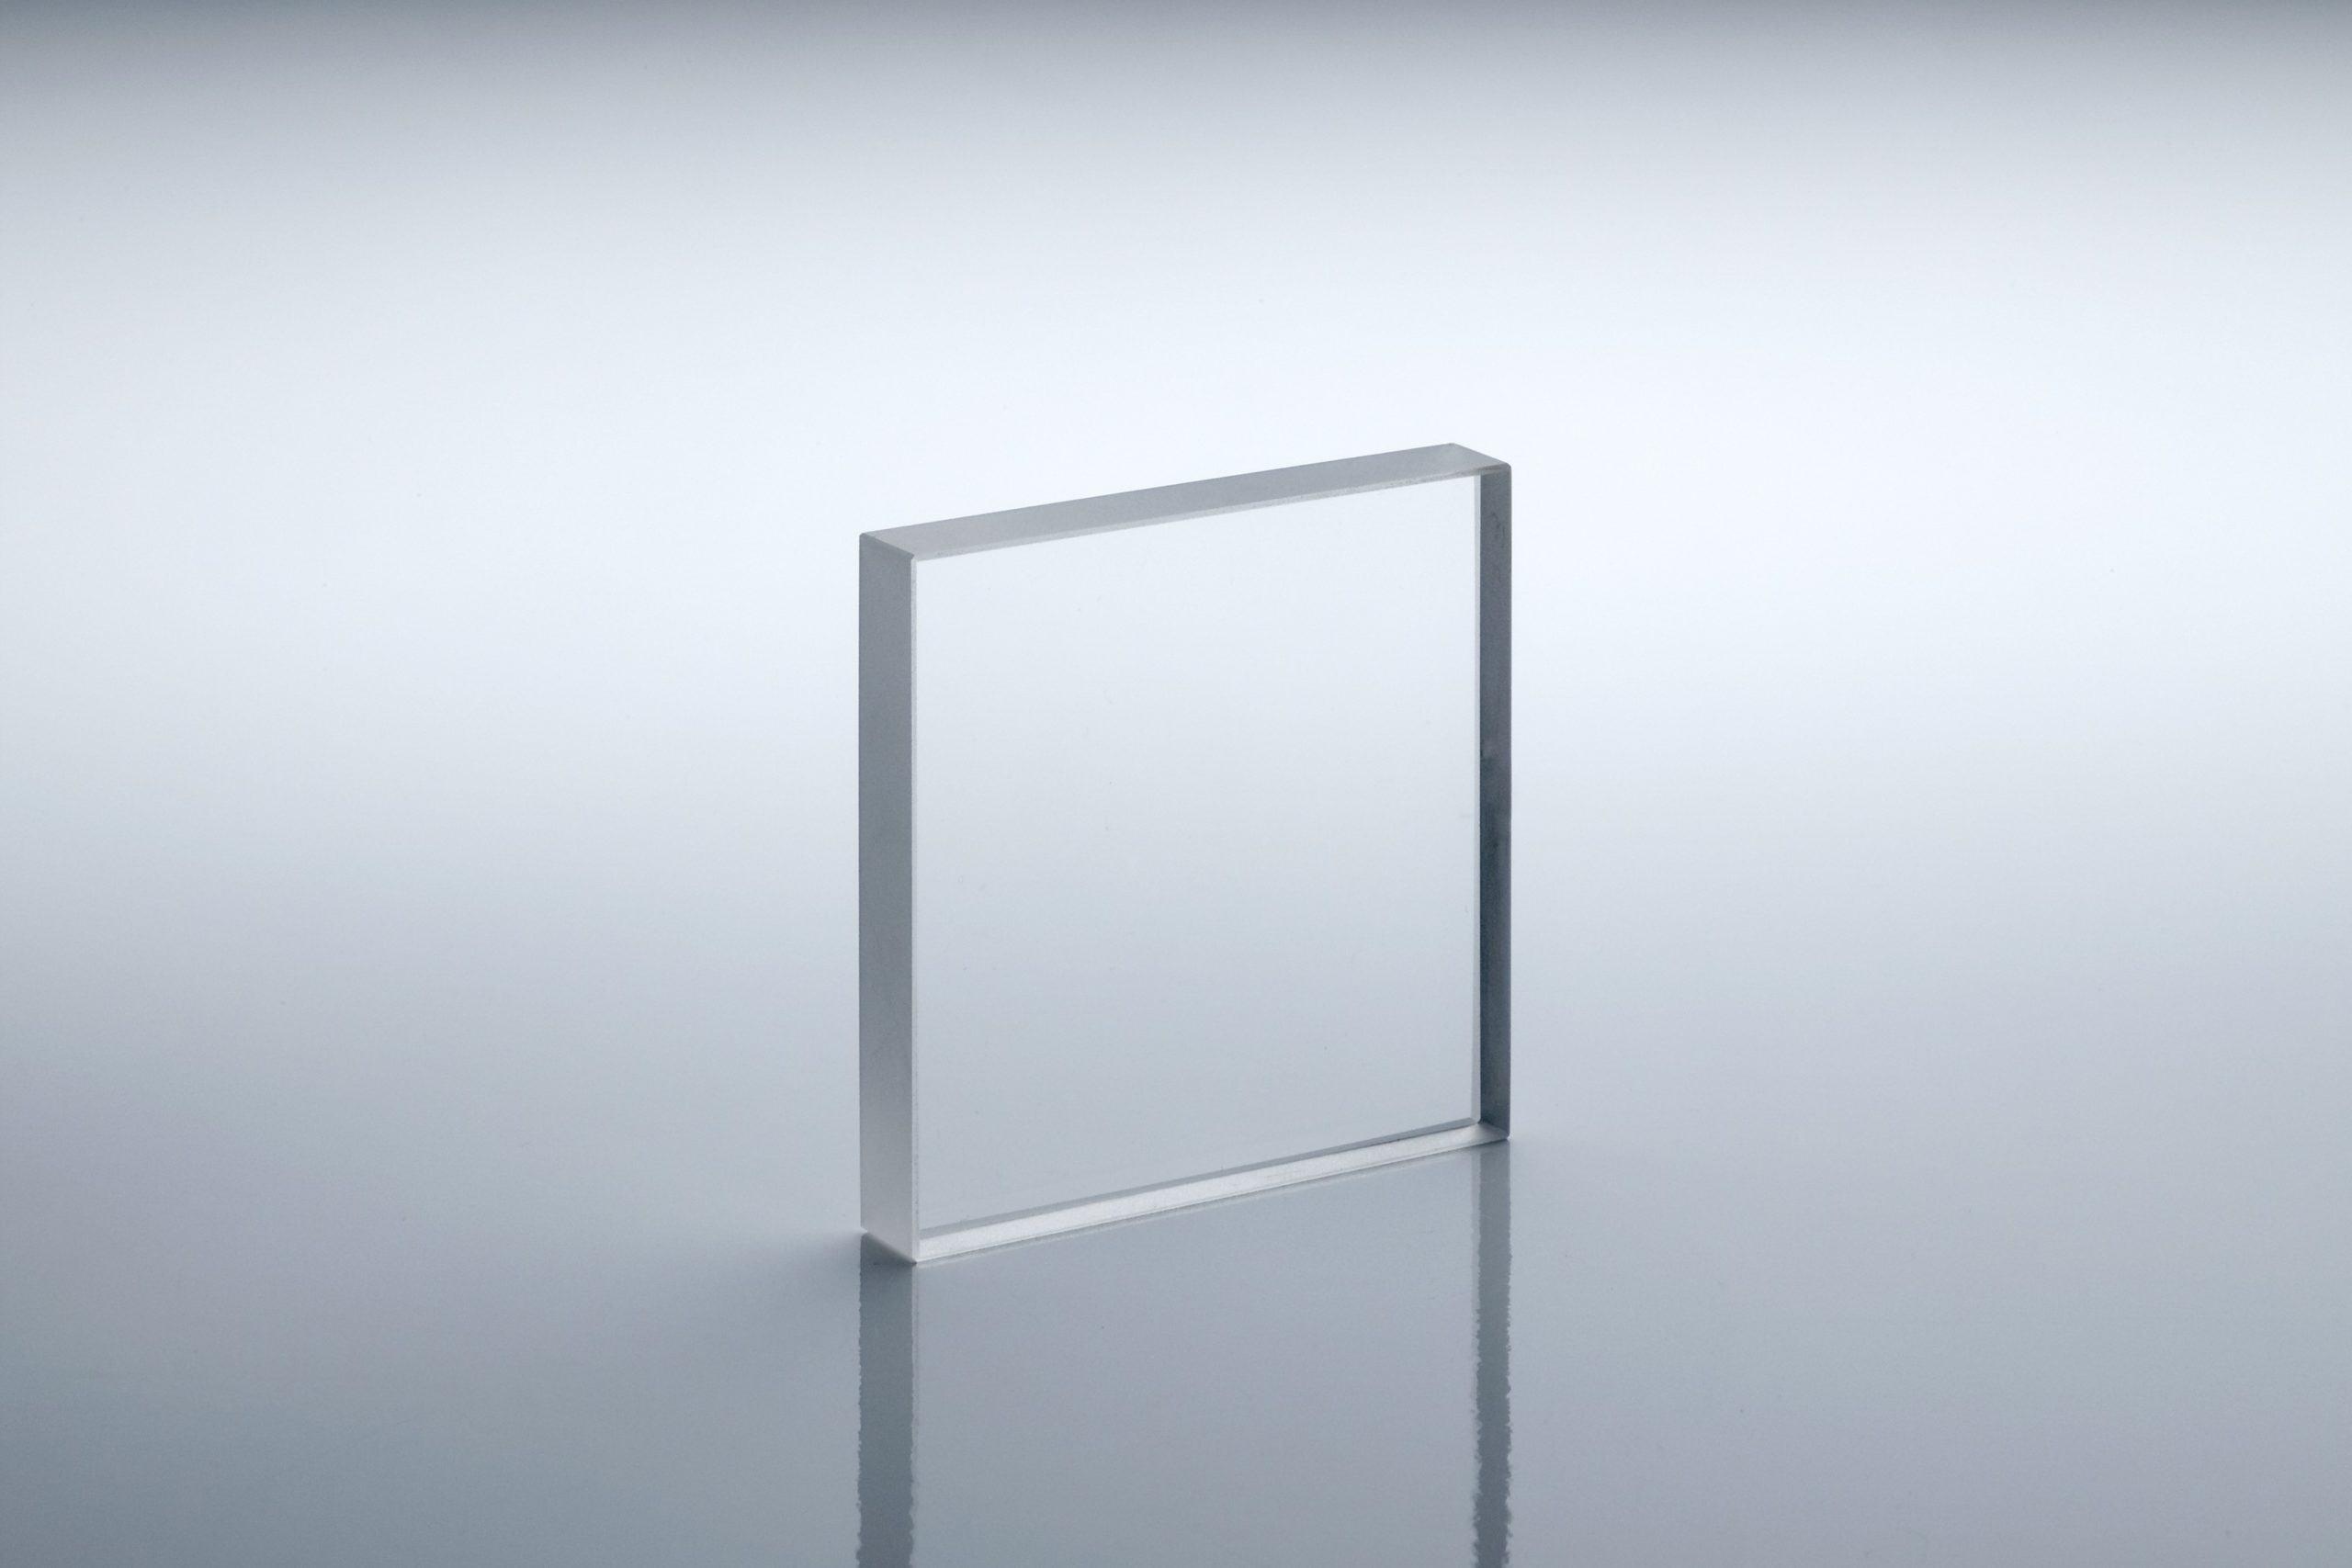 optical windows & diffusers for underwater optics